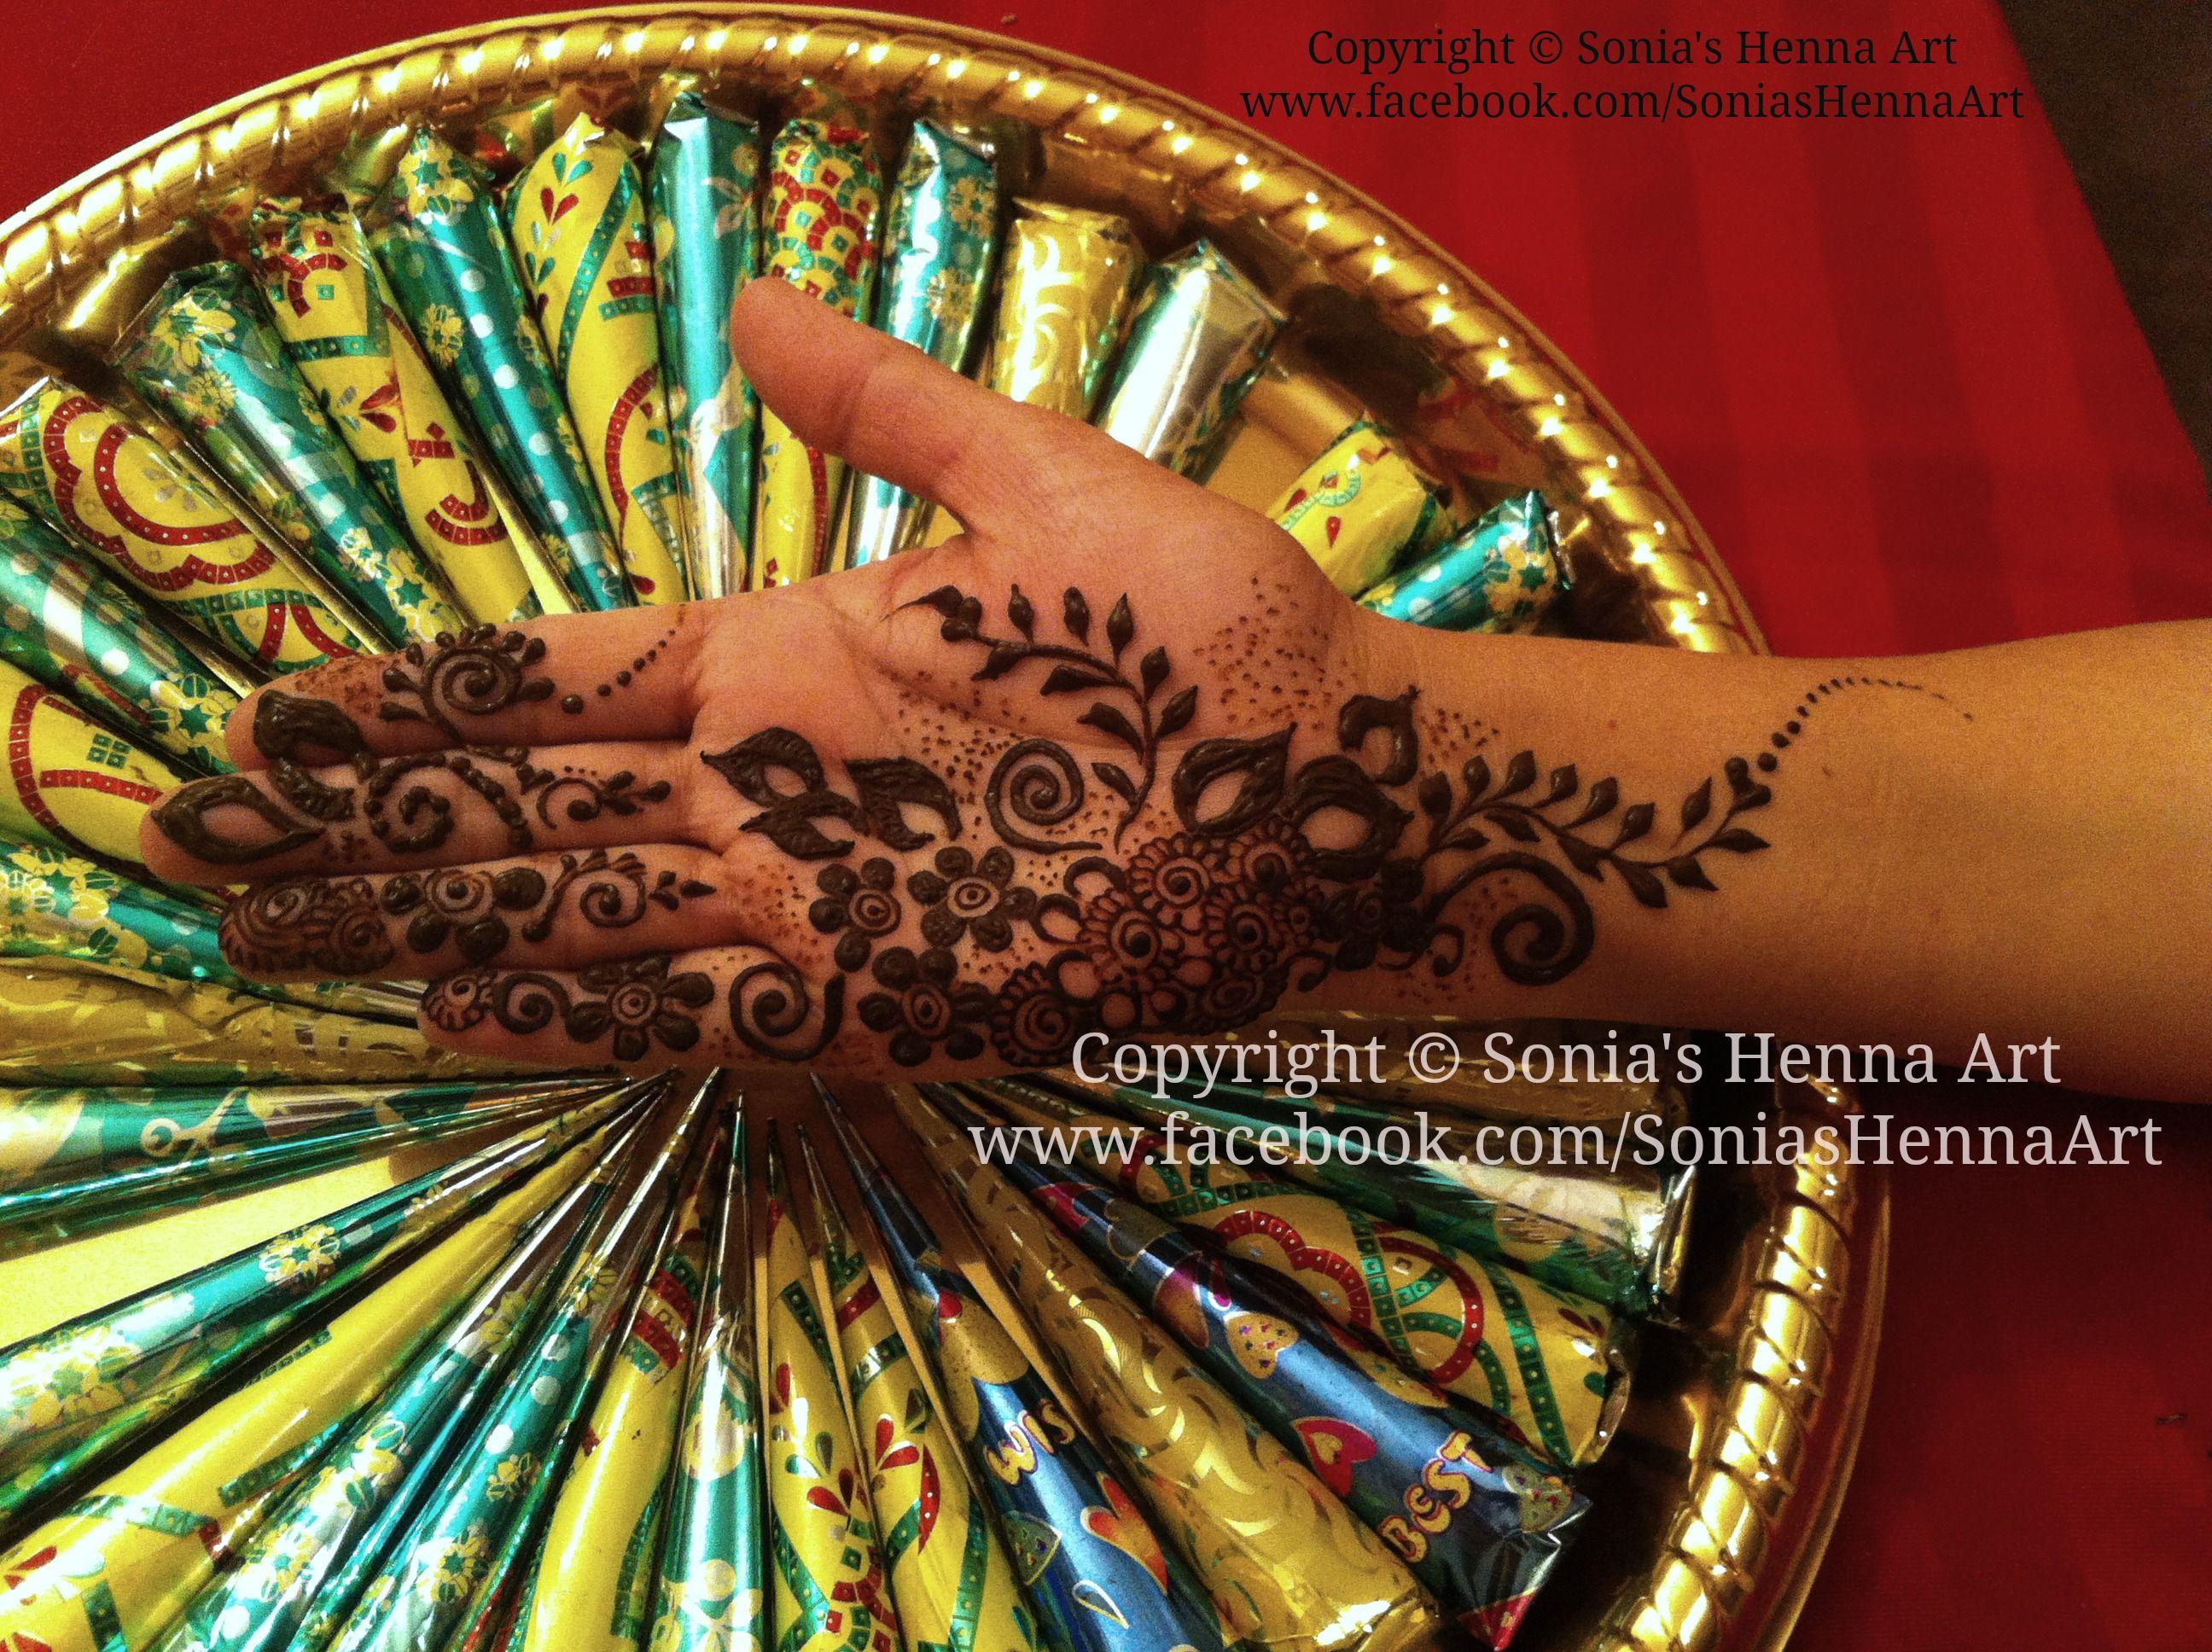 Copyright © Sonia's Henna Art Bridal, henna artist, desi, bridal, shadi, bridal henna , bridal, Henna Designs, mehndi service in toronto, Scarborough, destination wedding, henna artist,henna tattoo, bridal mehndi, south asian mehndi, Indian Traditional Henna, Bridal henna, Mehindi, Mahndi, Heena, mehndi artist, glitter, Free henna,Pakistani style mehndi, arabic mehndi, cheap henna in toronto, low price of henna, mehandi, design, new, art, Indian weddings,